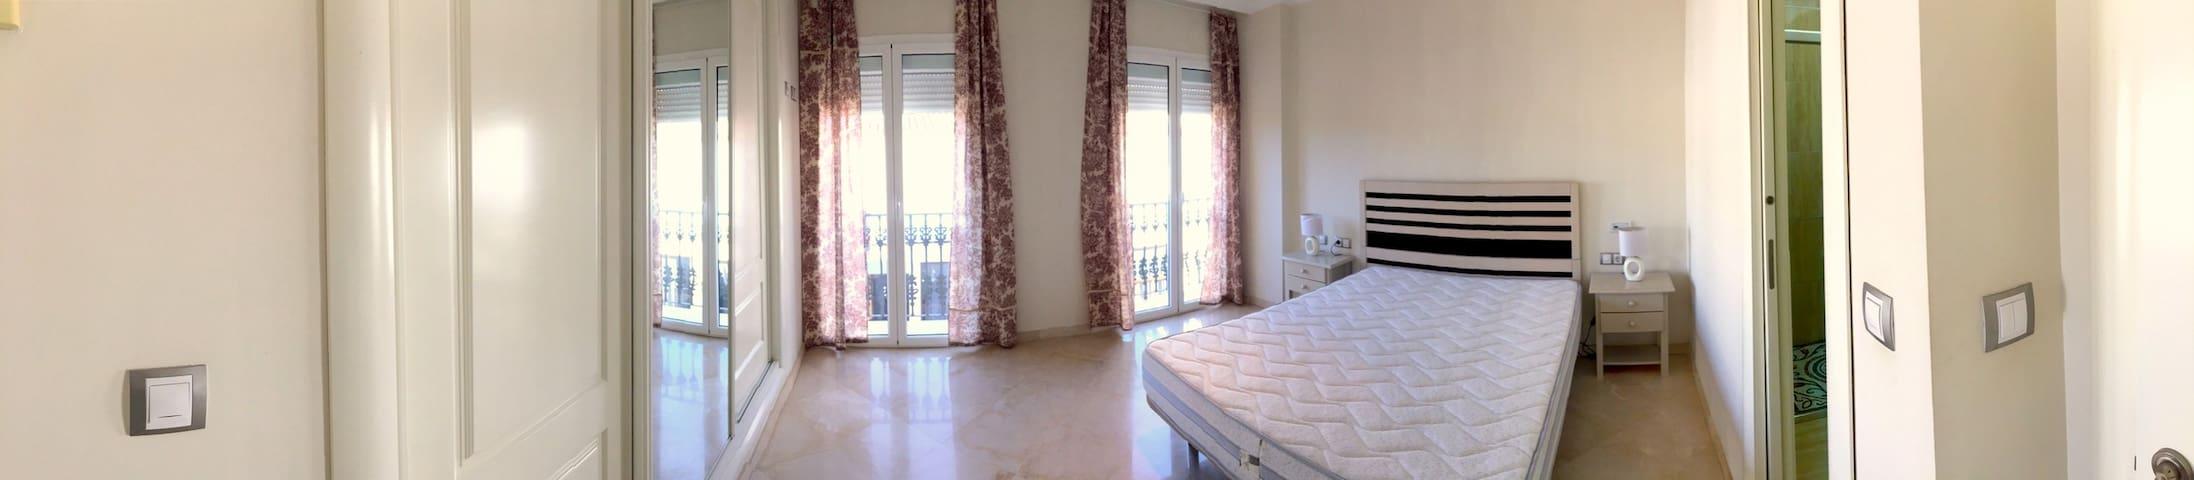 Apartamento de lujo ZAFRA (Badajoz) Plaza España - Zafra - Wohnung